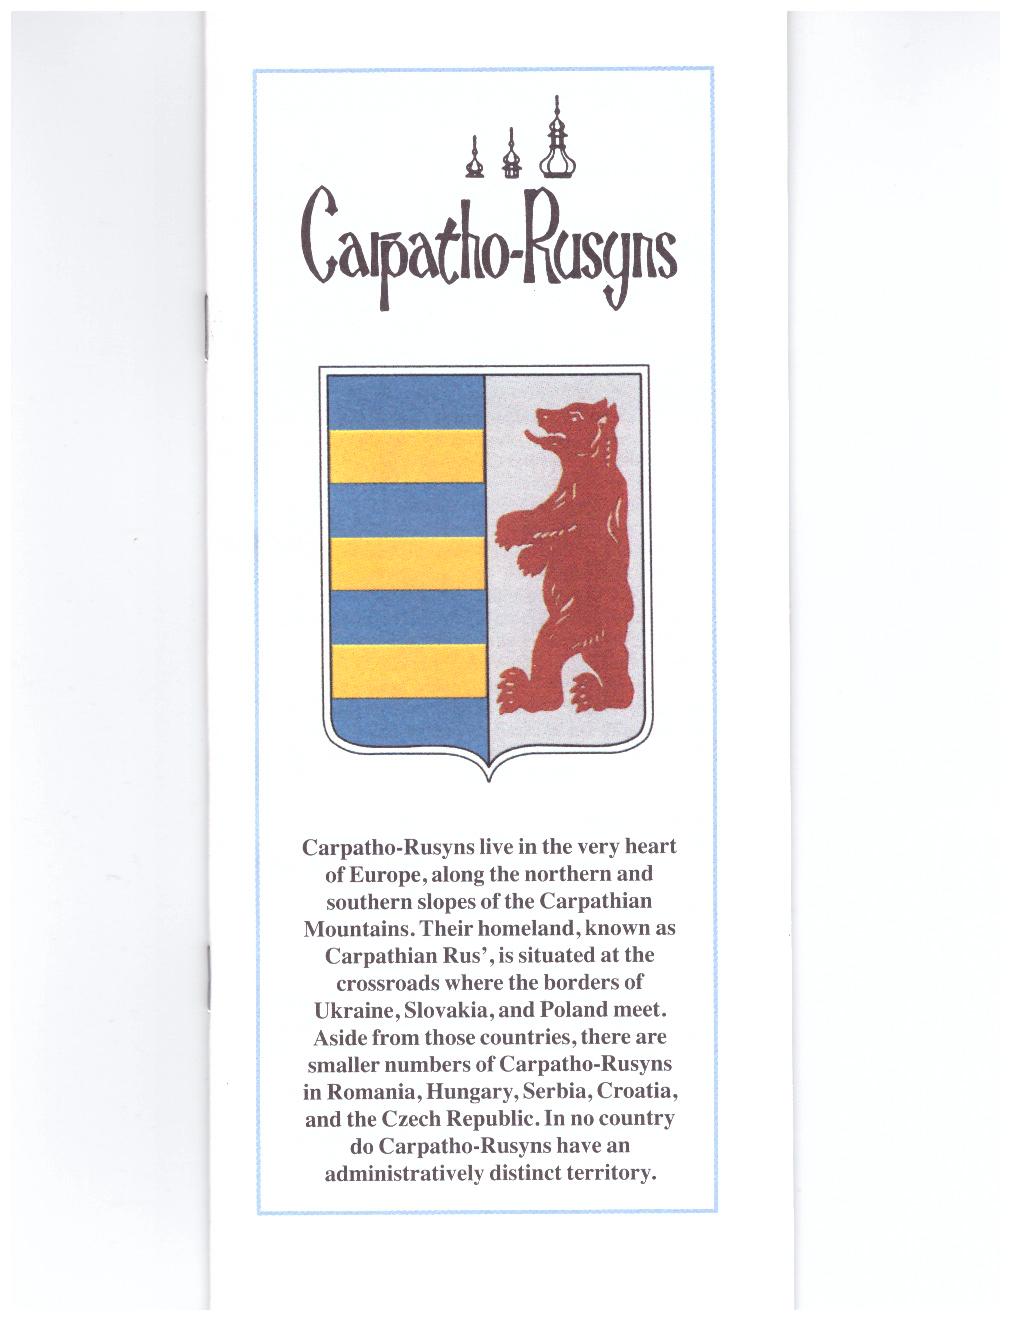 Carpatho-Rusyn brochure